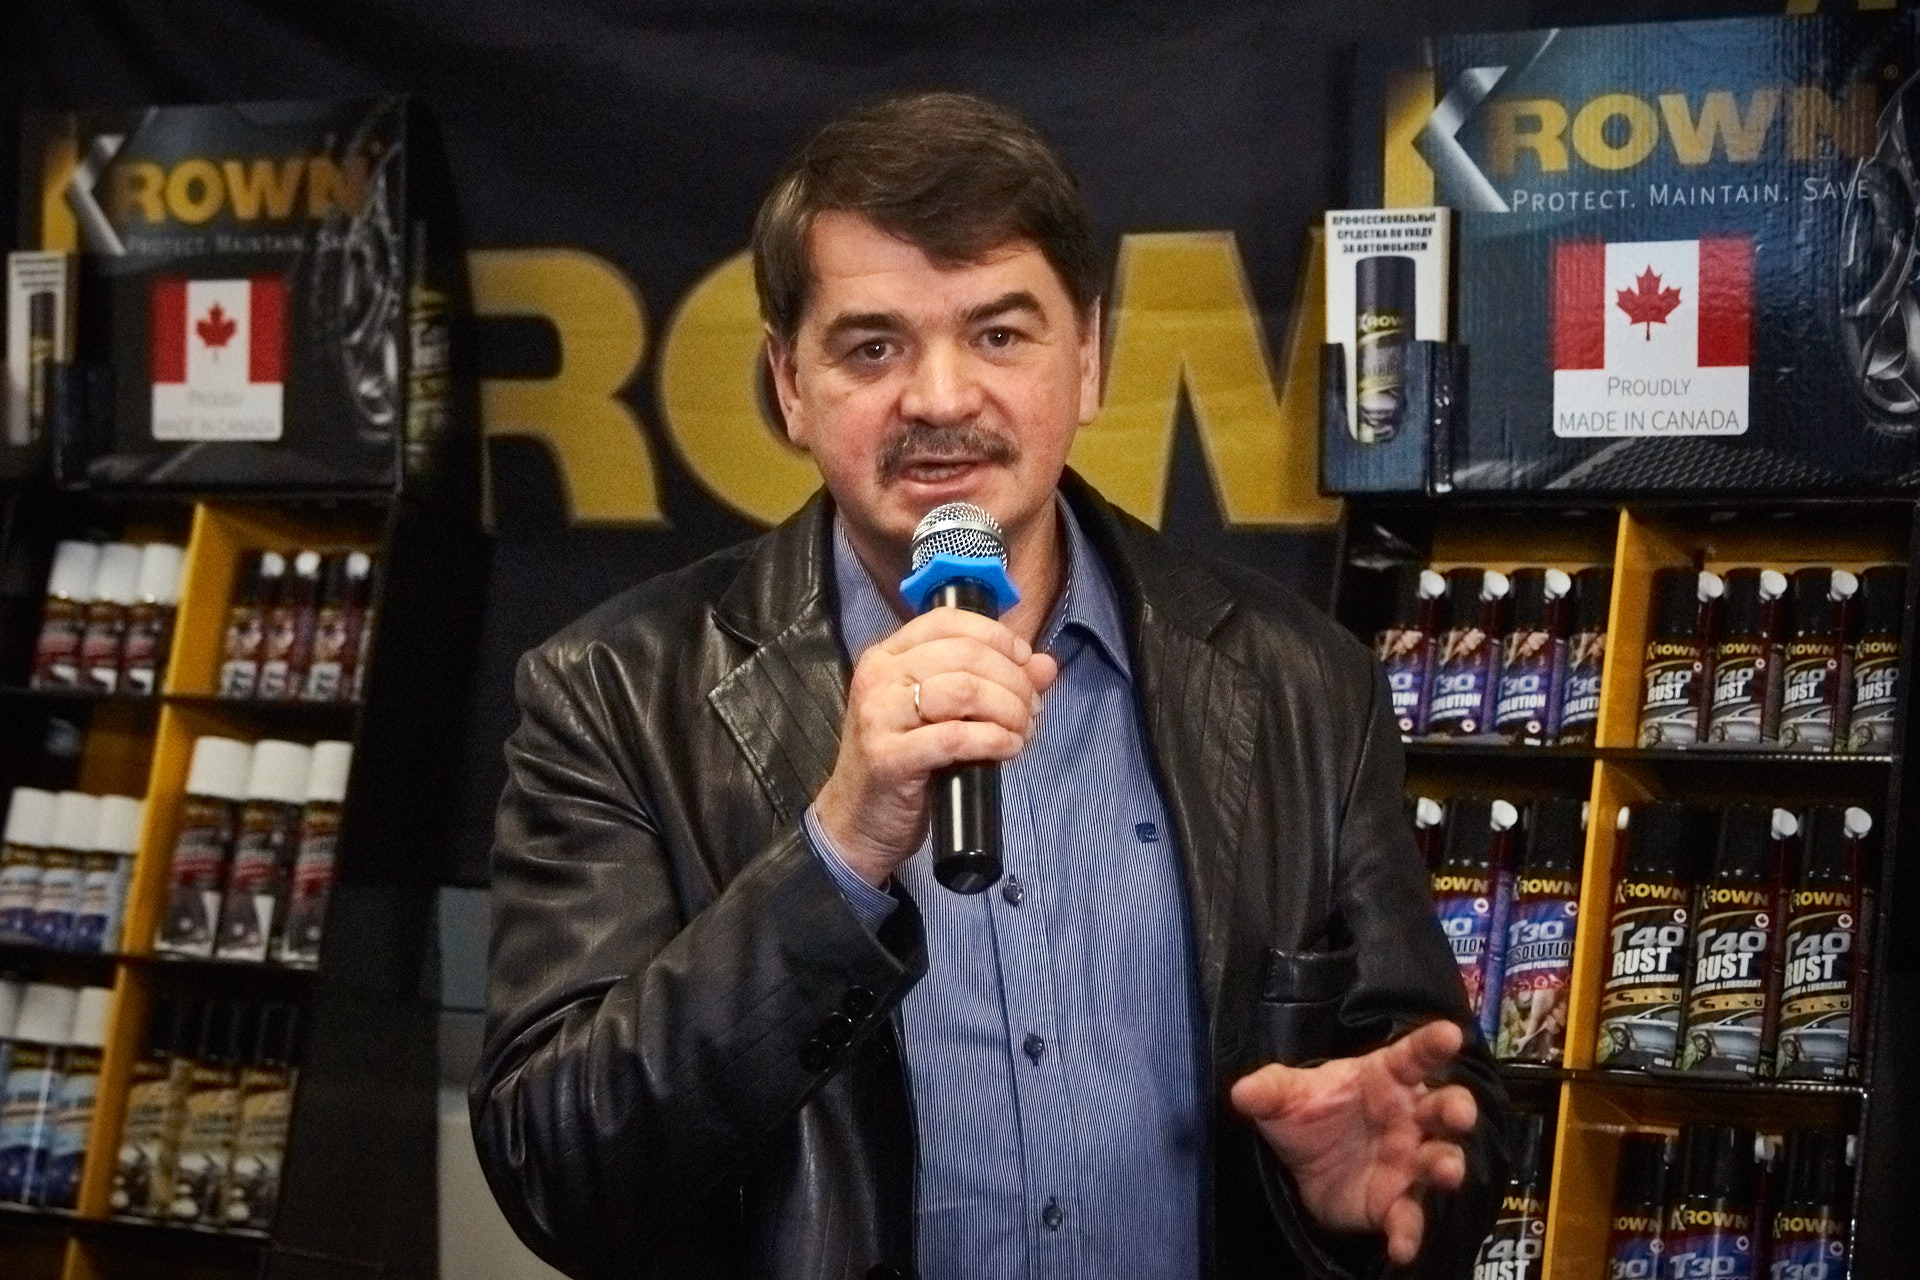 Олег Дмитриевич Звягин - председатель совета учредителей Krown РФ